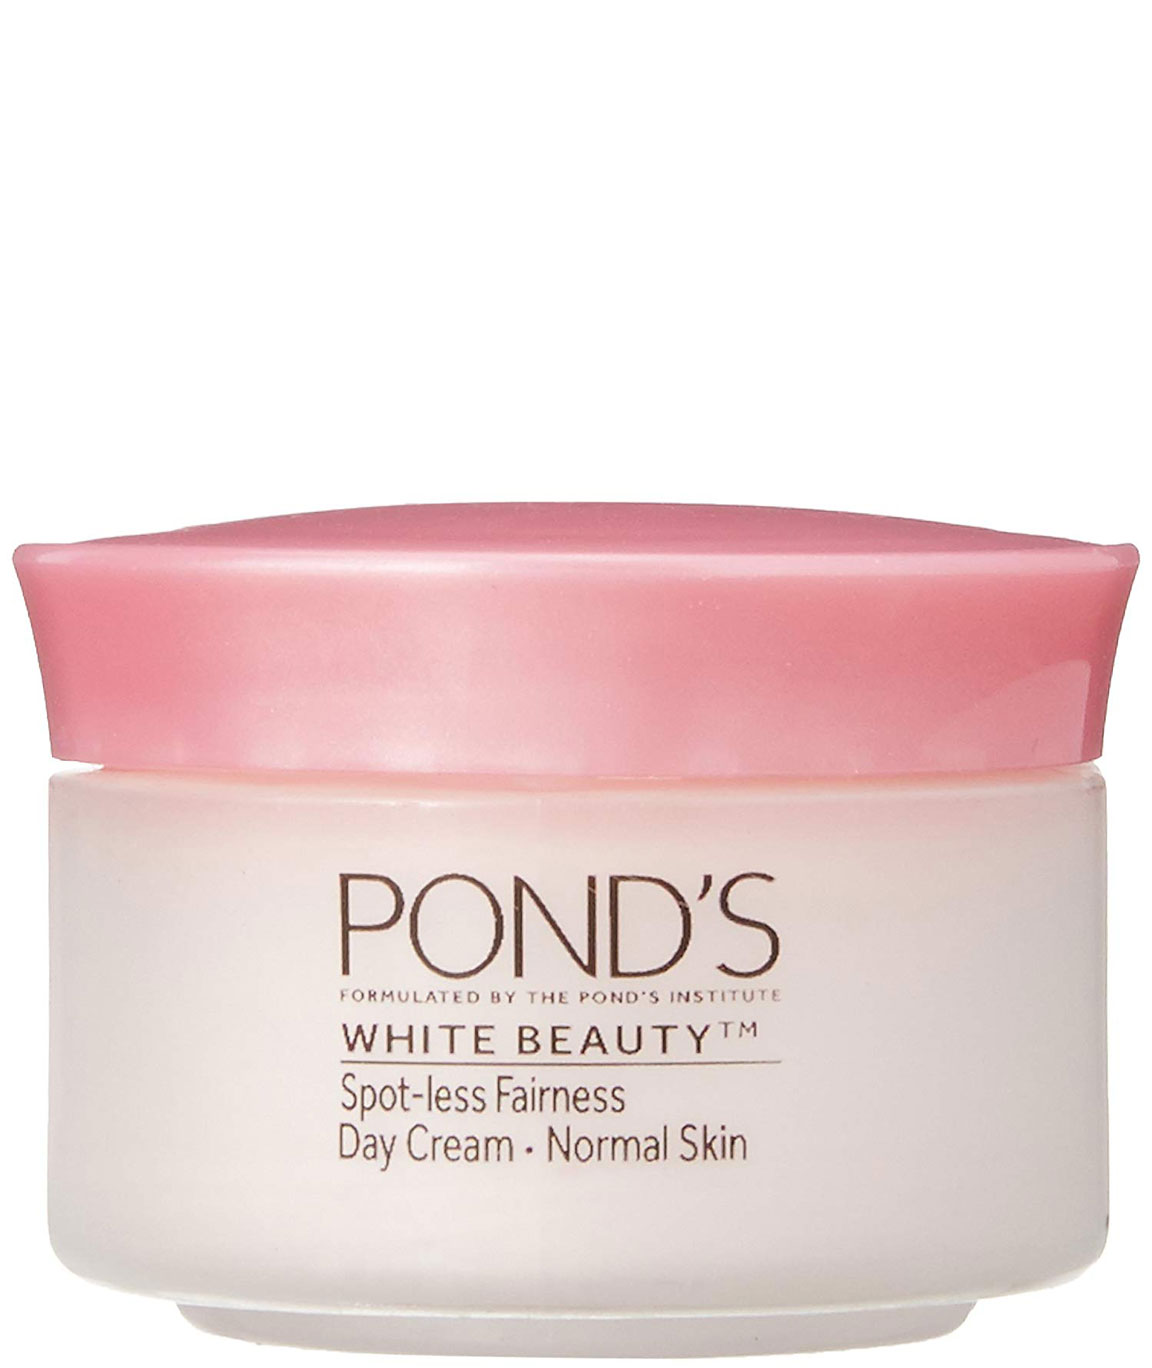 PONDS White Beauty Spot-less Fairness Day Cream, 23gm